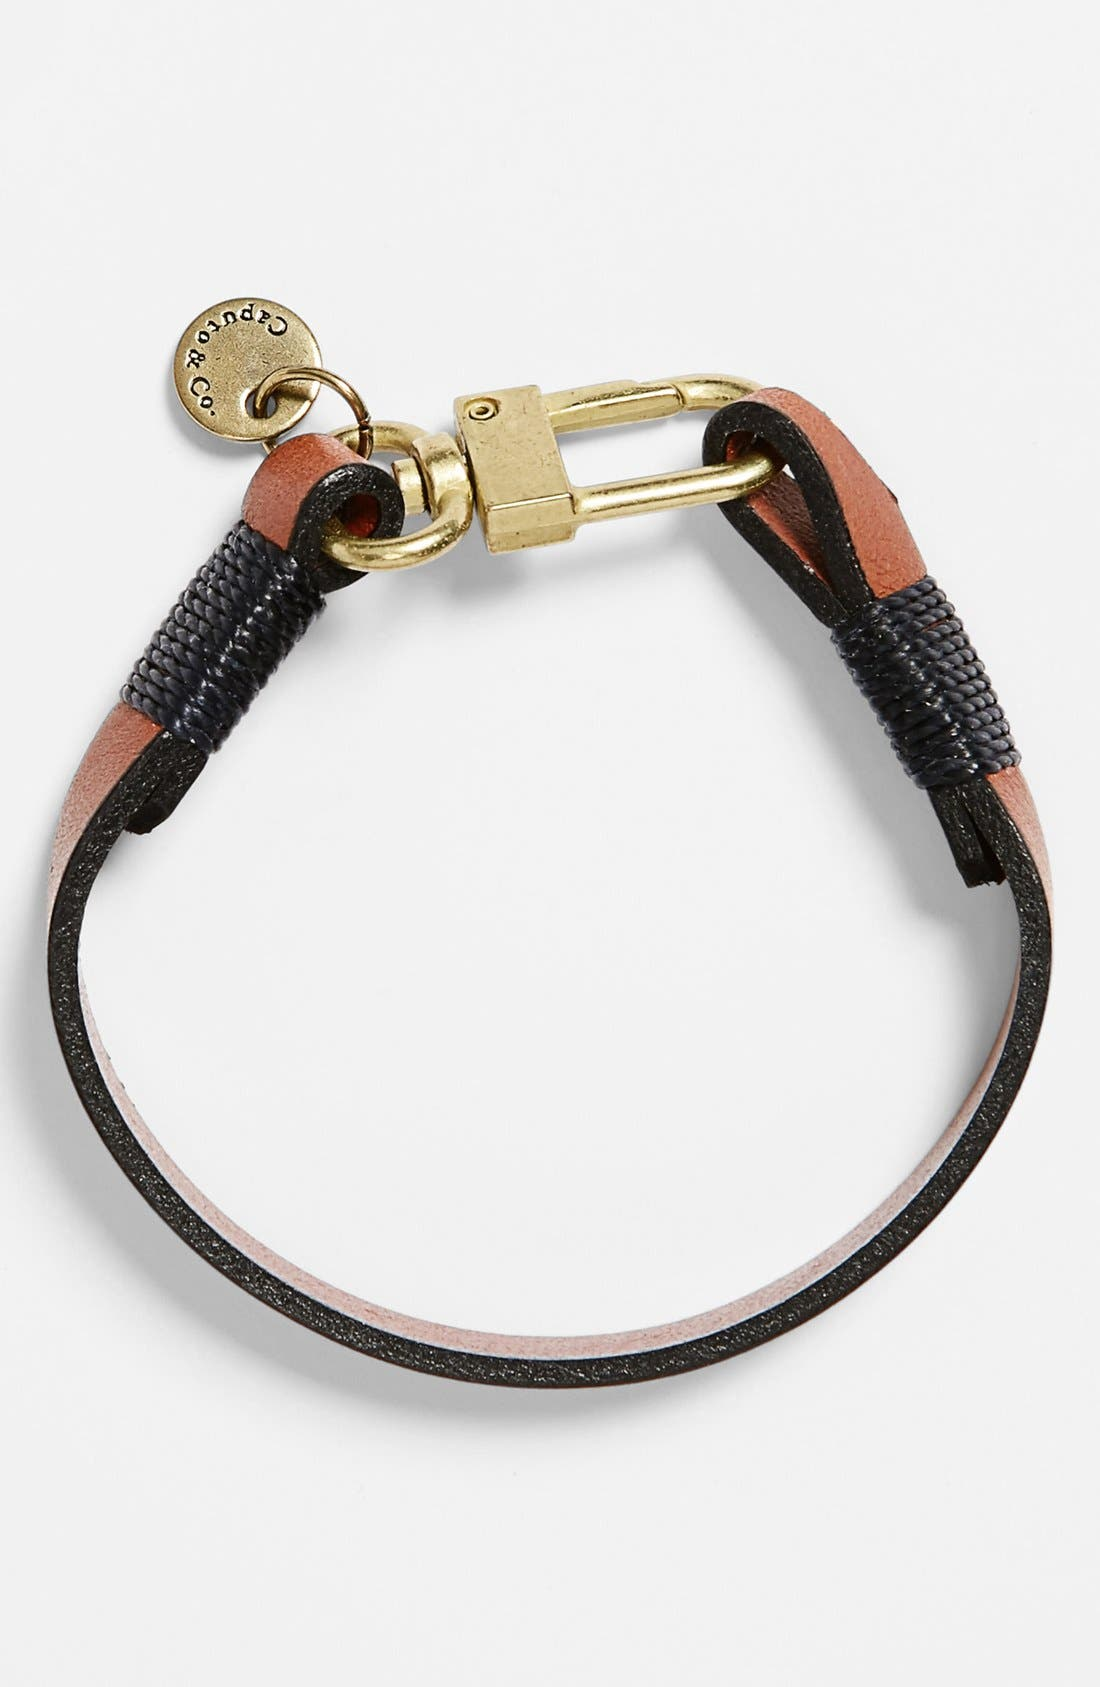 Main Image - CAPUTO & CO 'The Clean' Leather Bracelet